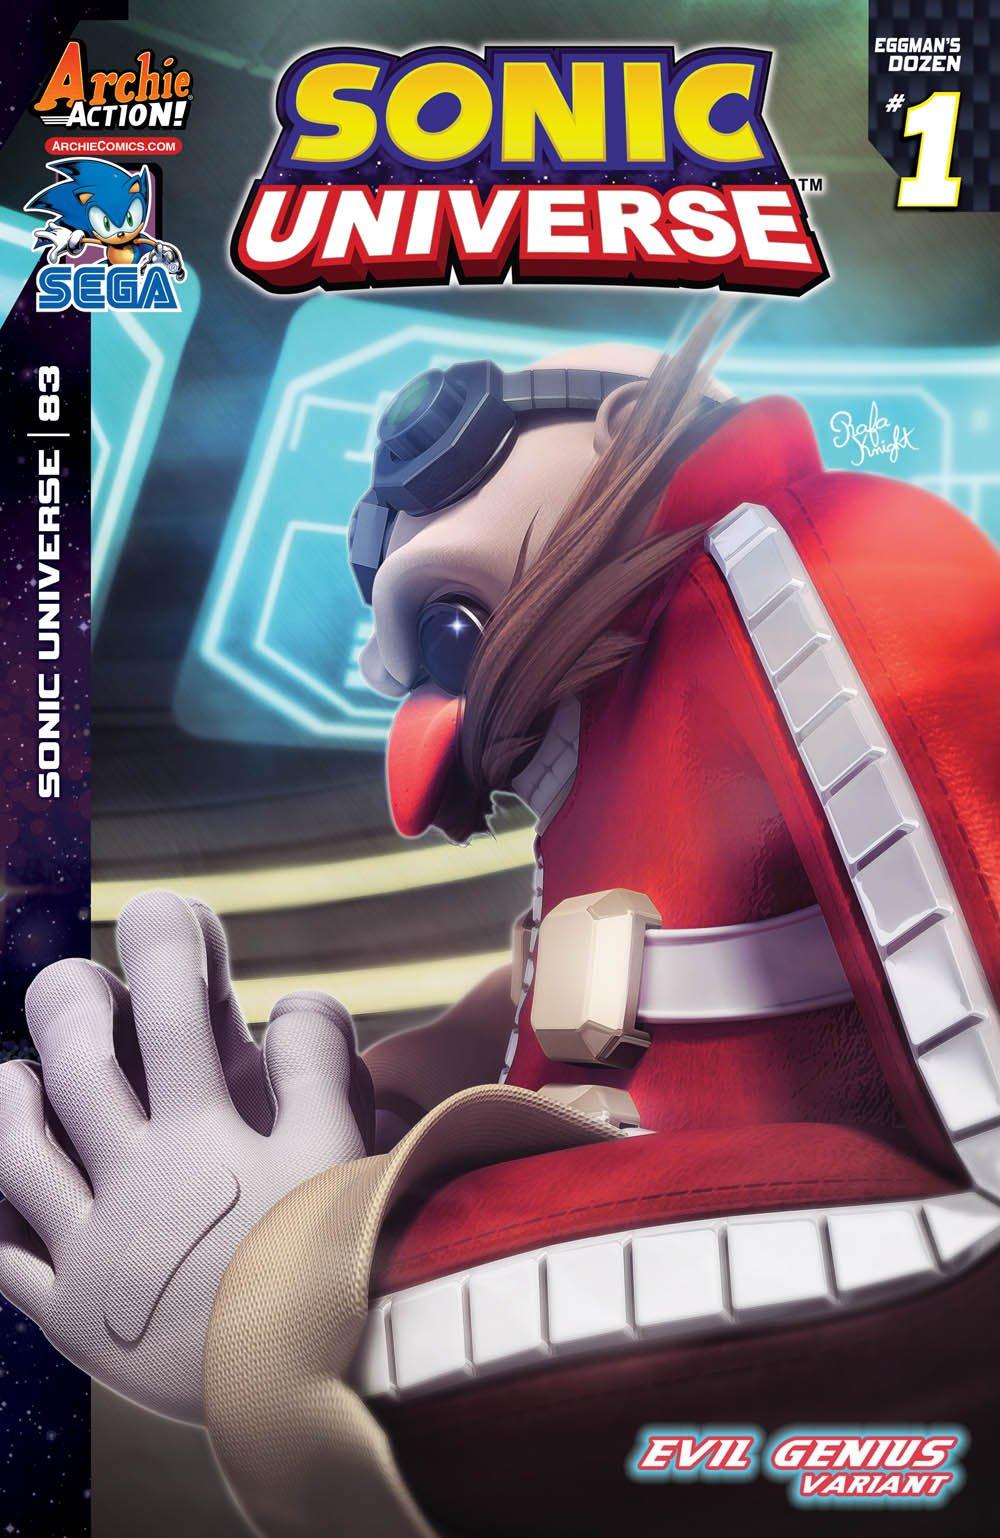 Sonic Universe 083 (May 2016) (Evil Genius variant)